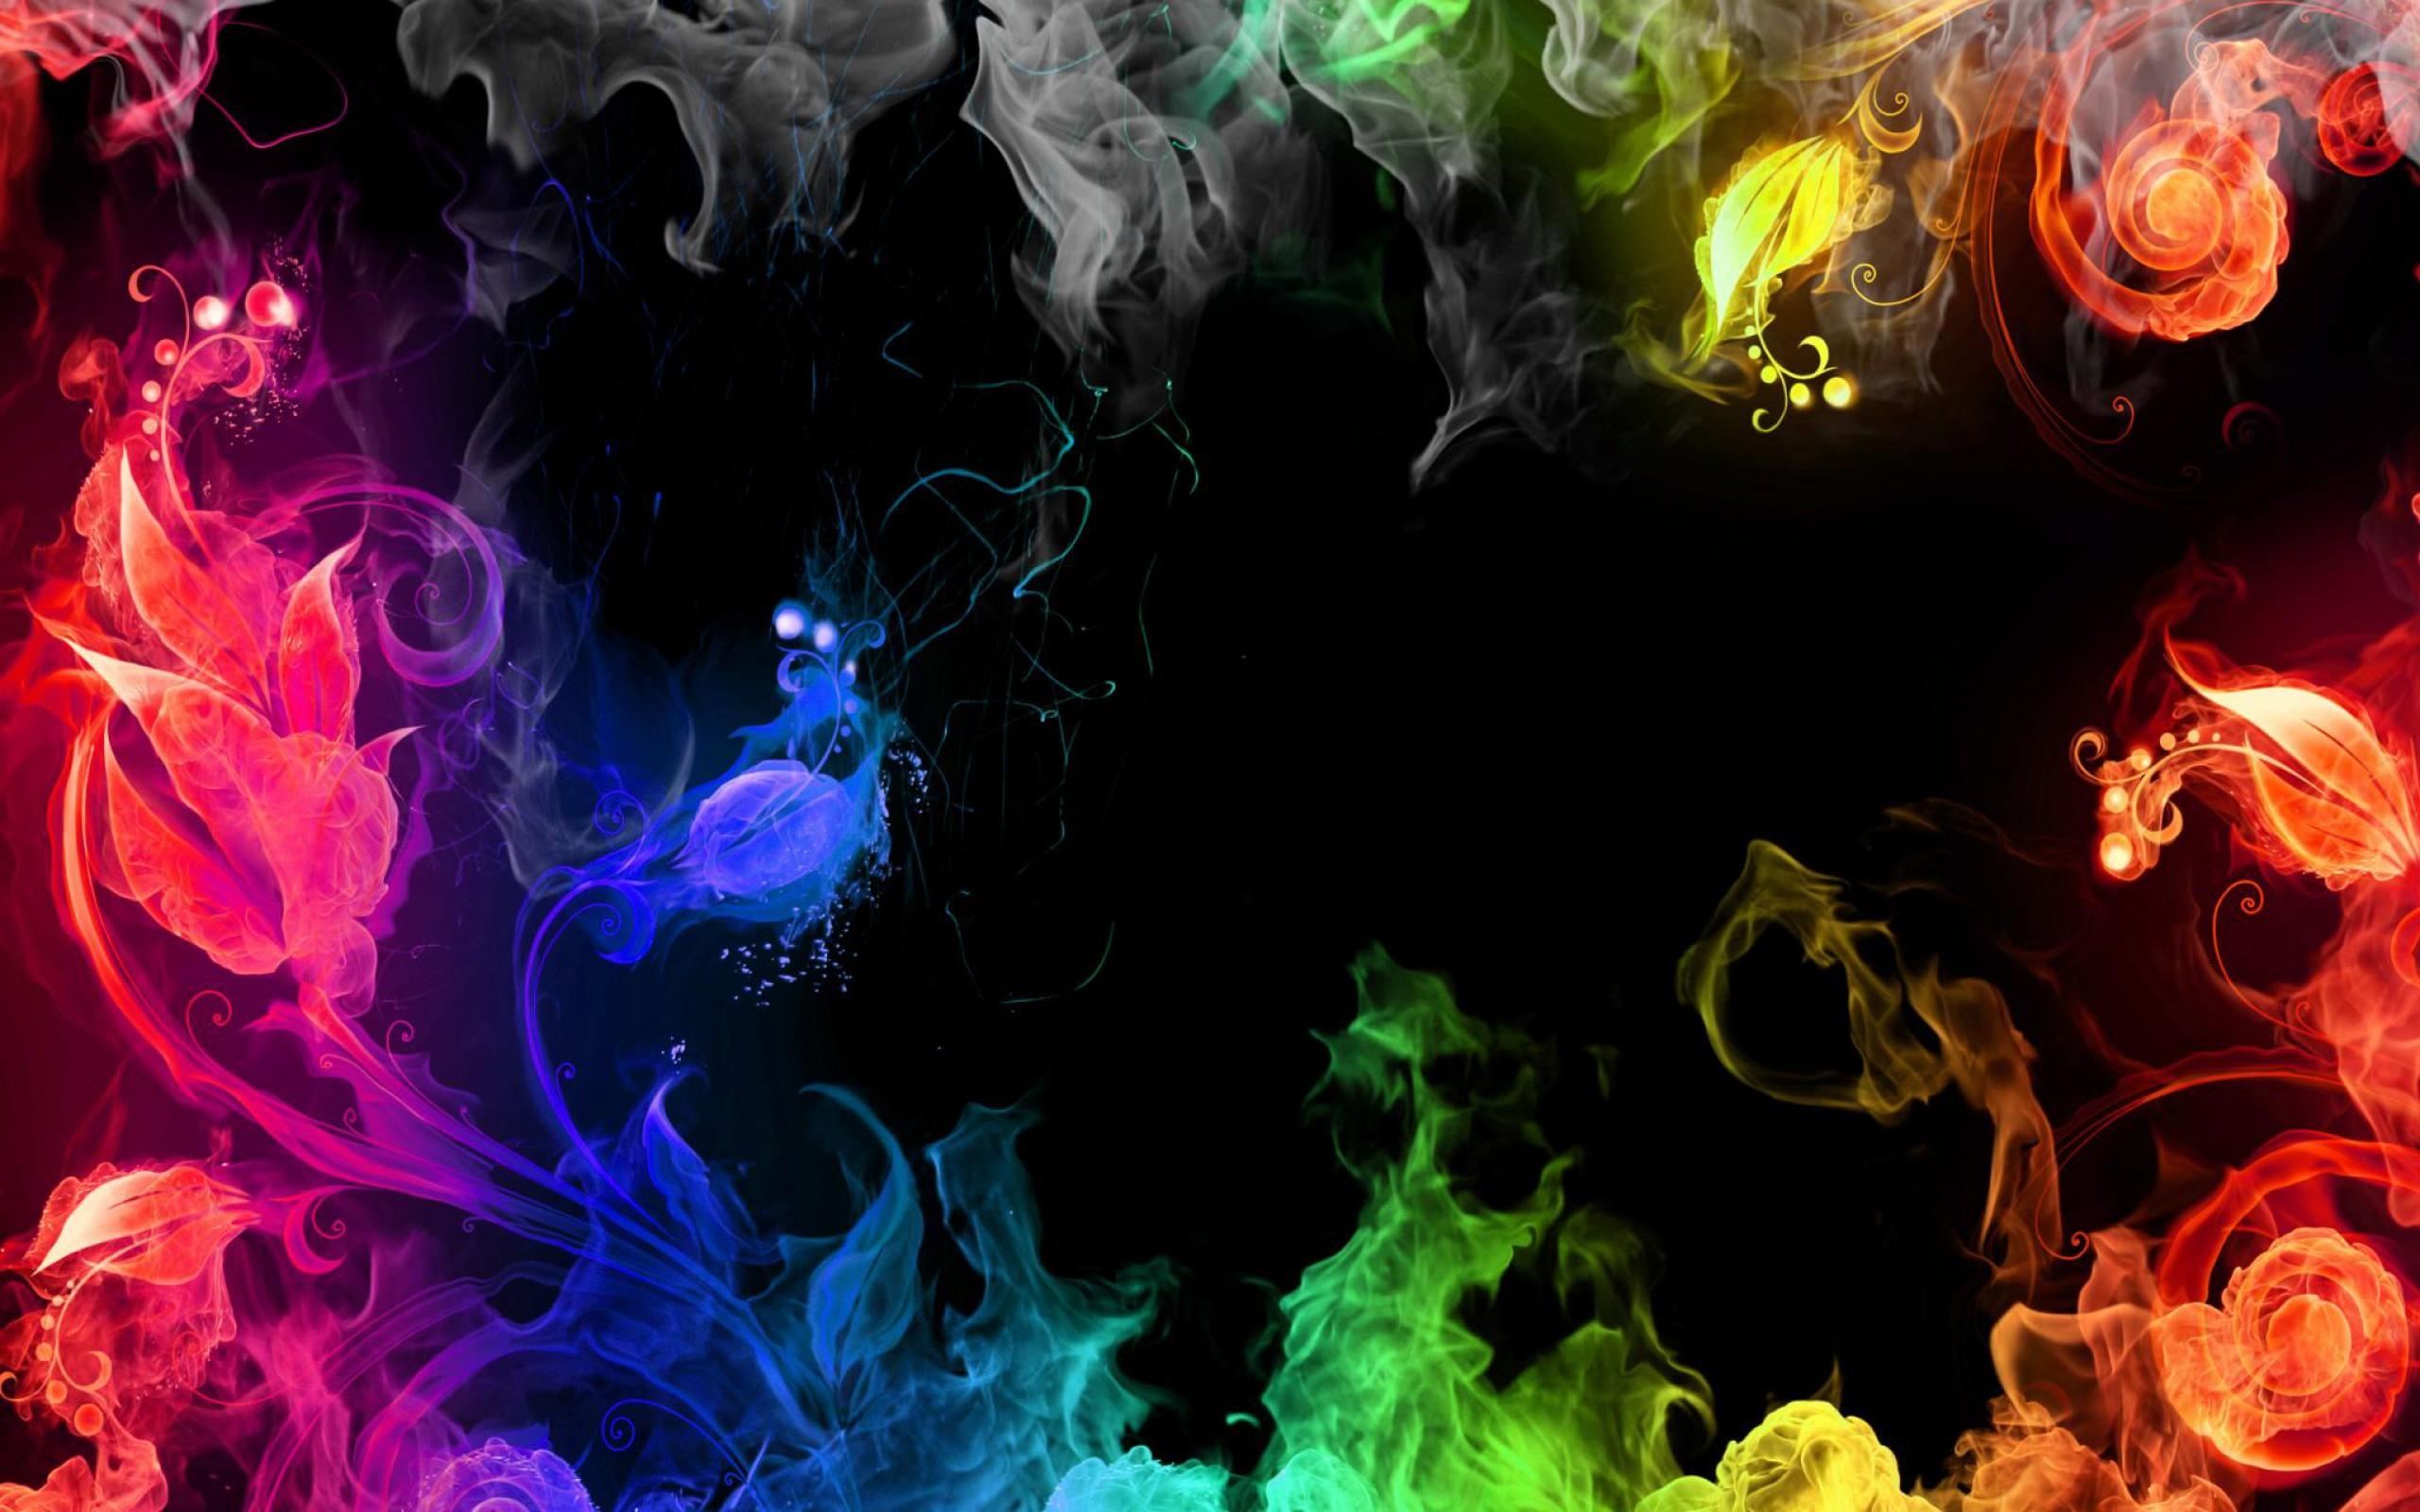 Rainbow dash sky wallpapers colors space wallpaper rainbows images | Photos  | Pinterest | Rainbow dash, Rainbows and Wallpaper